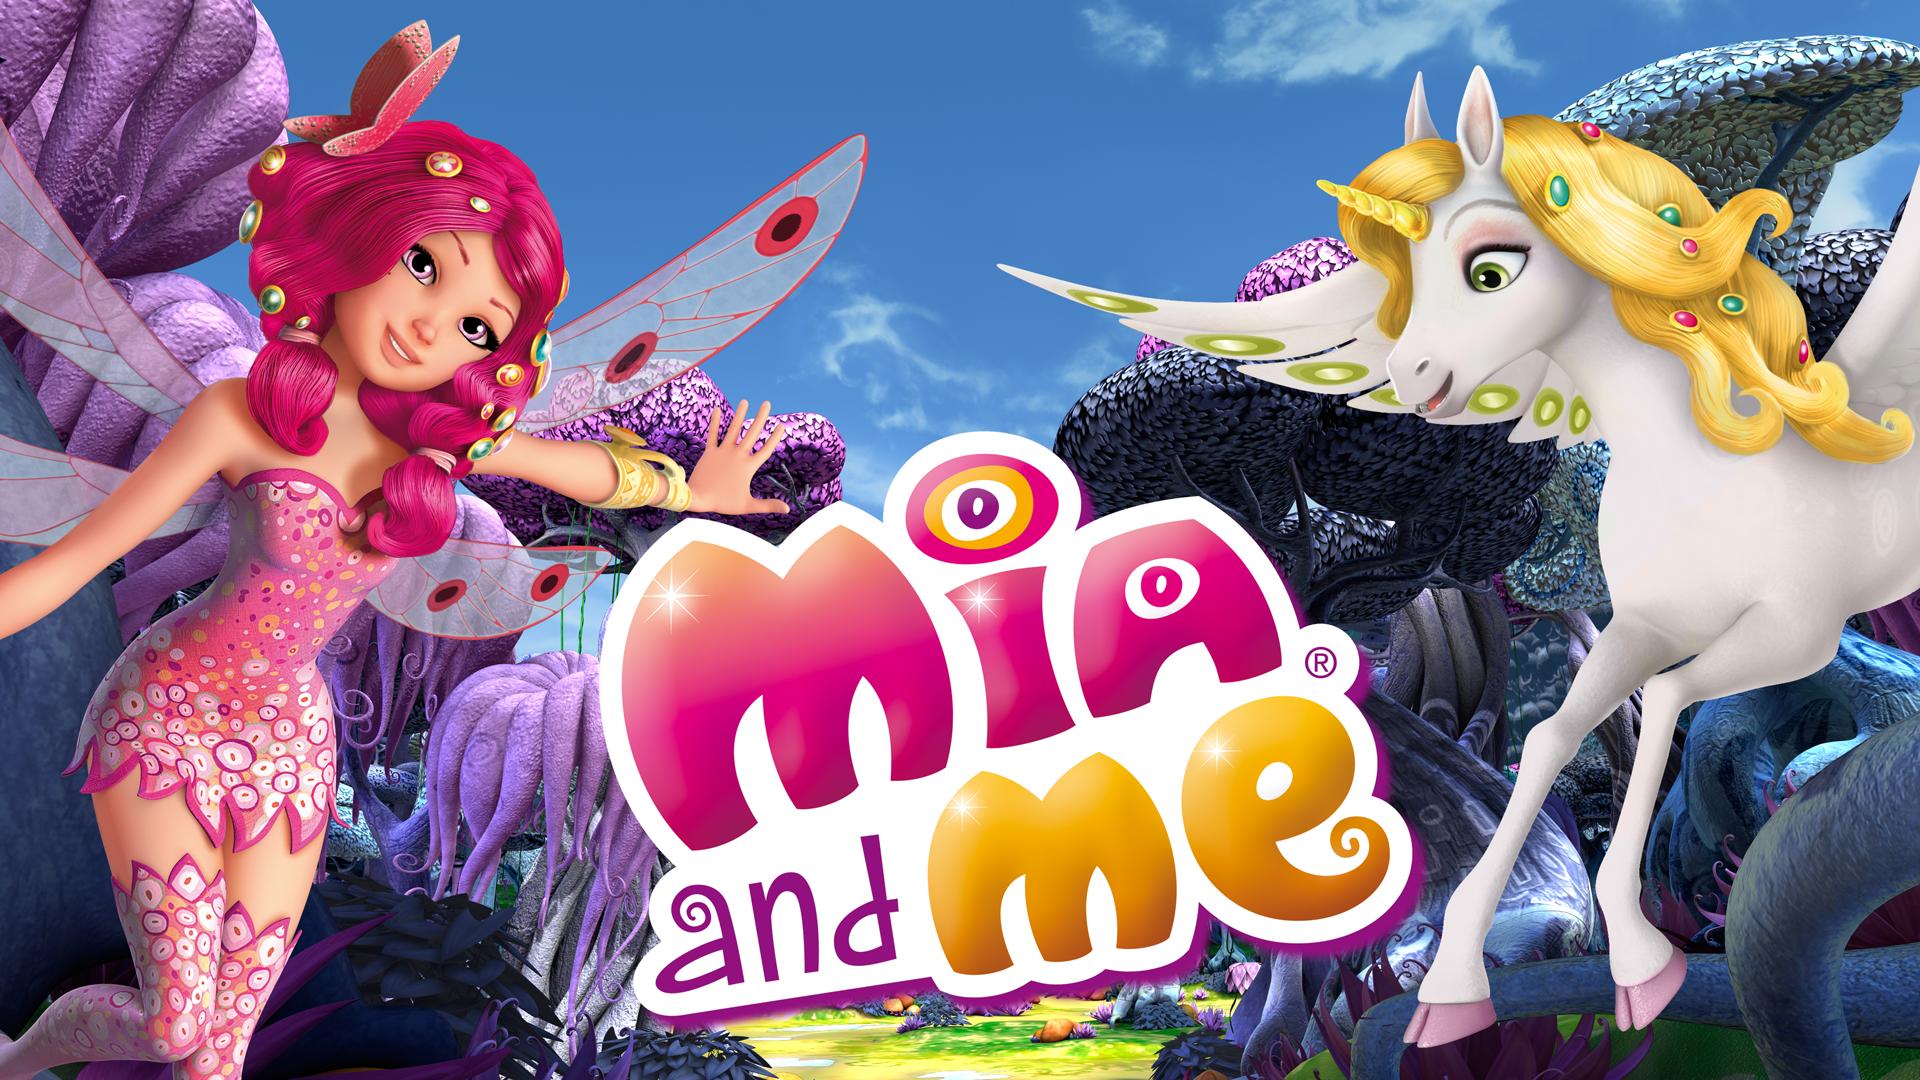 Amazon co uk: Watch Mia and me | Prime Video